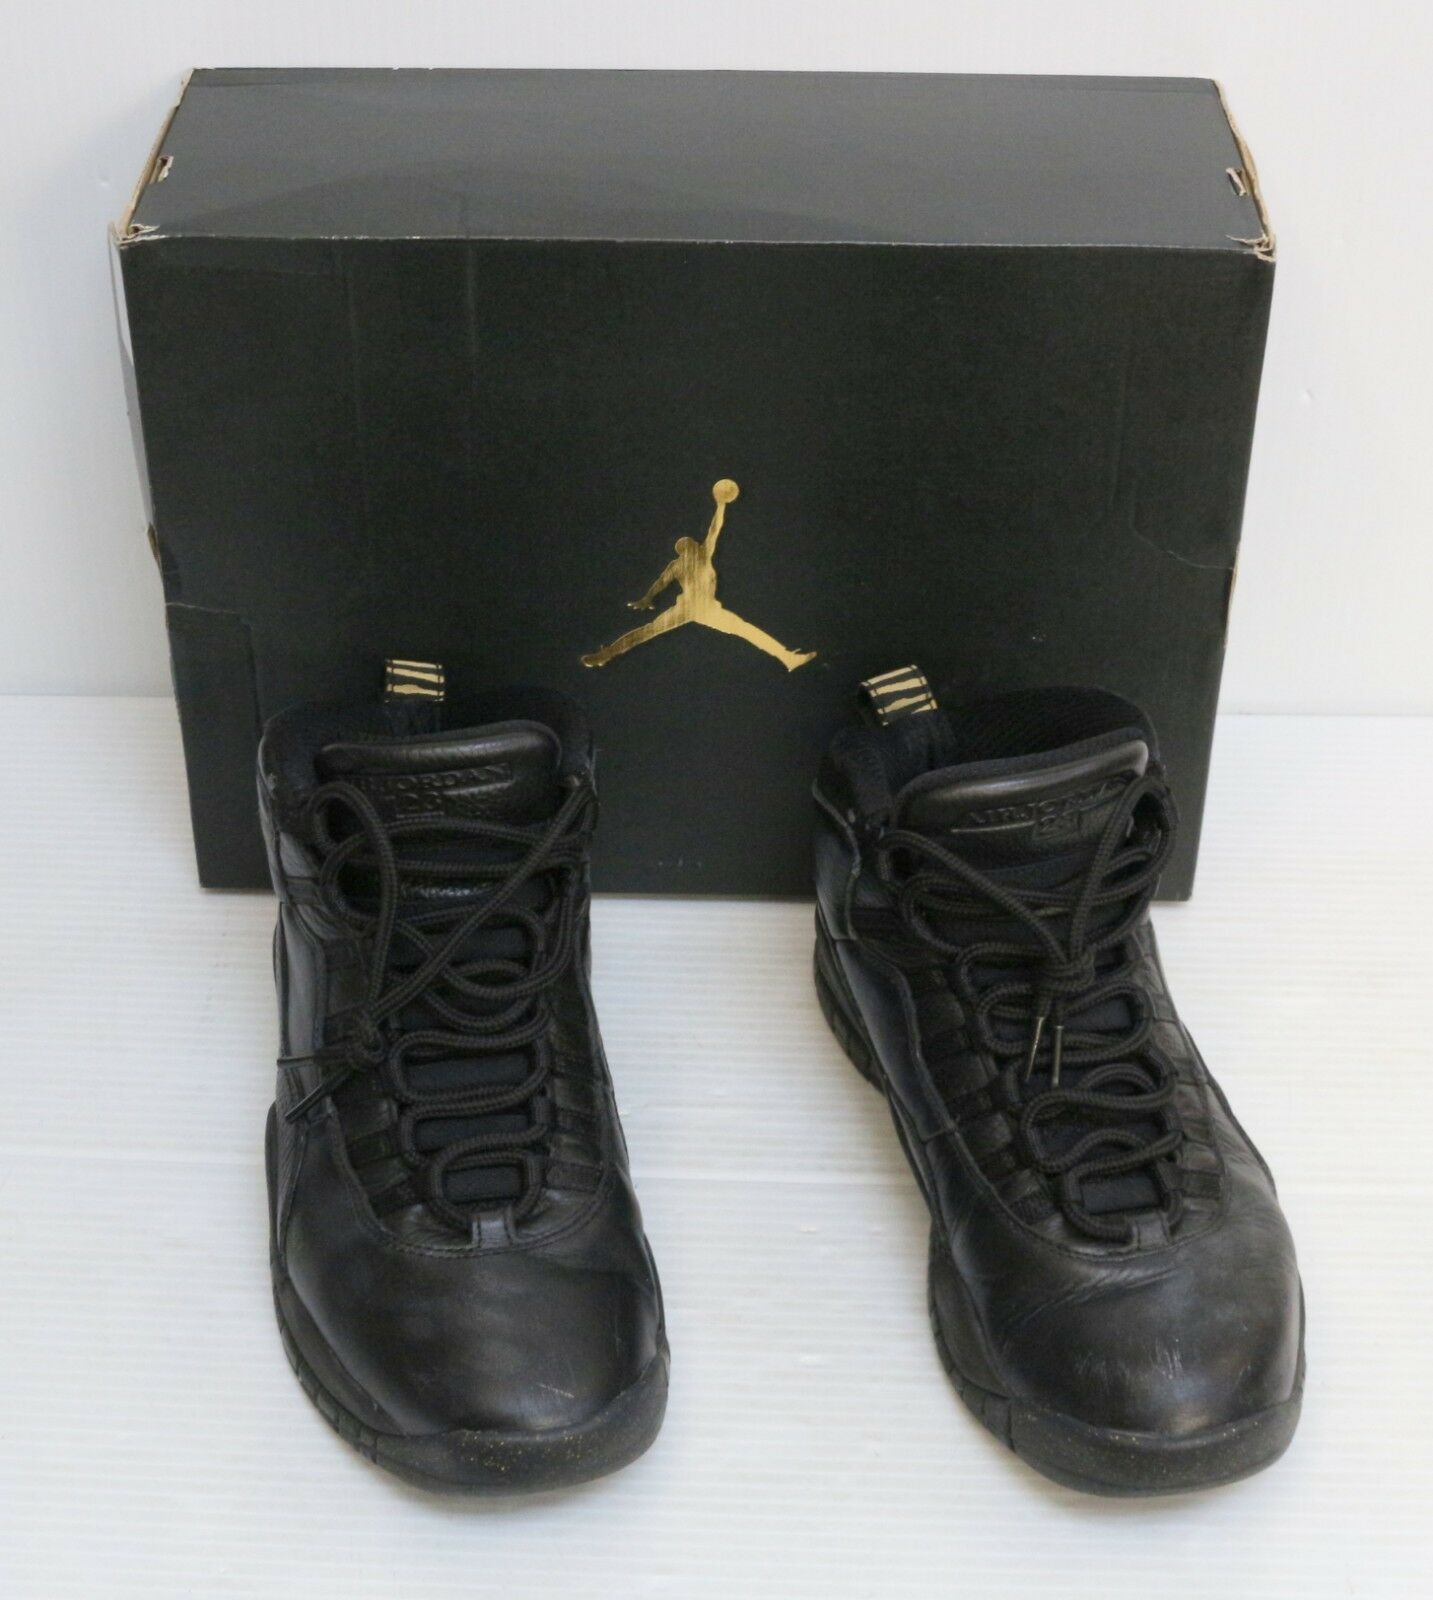 Nike Air Air Air Jordan 10 Retro NYC 310805-012 Black Size 9.5 City Pack DB Steel NYC 19b372